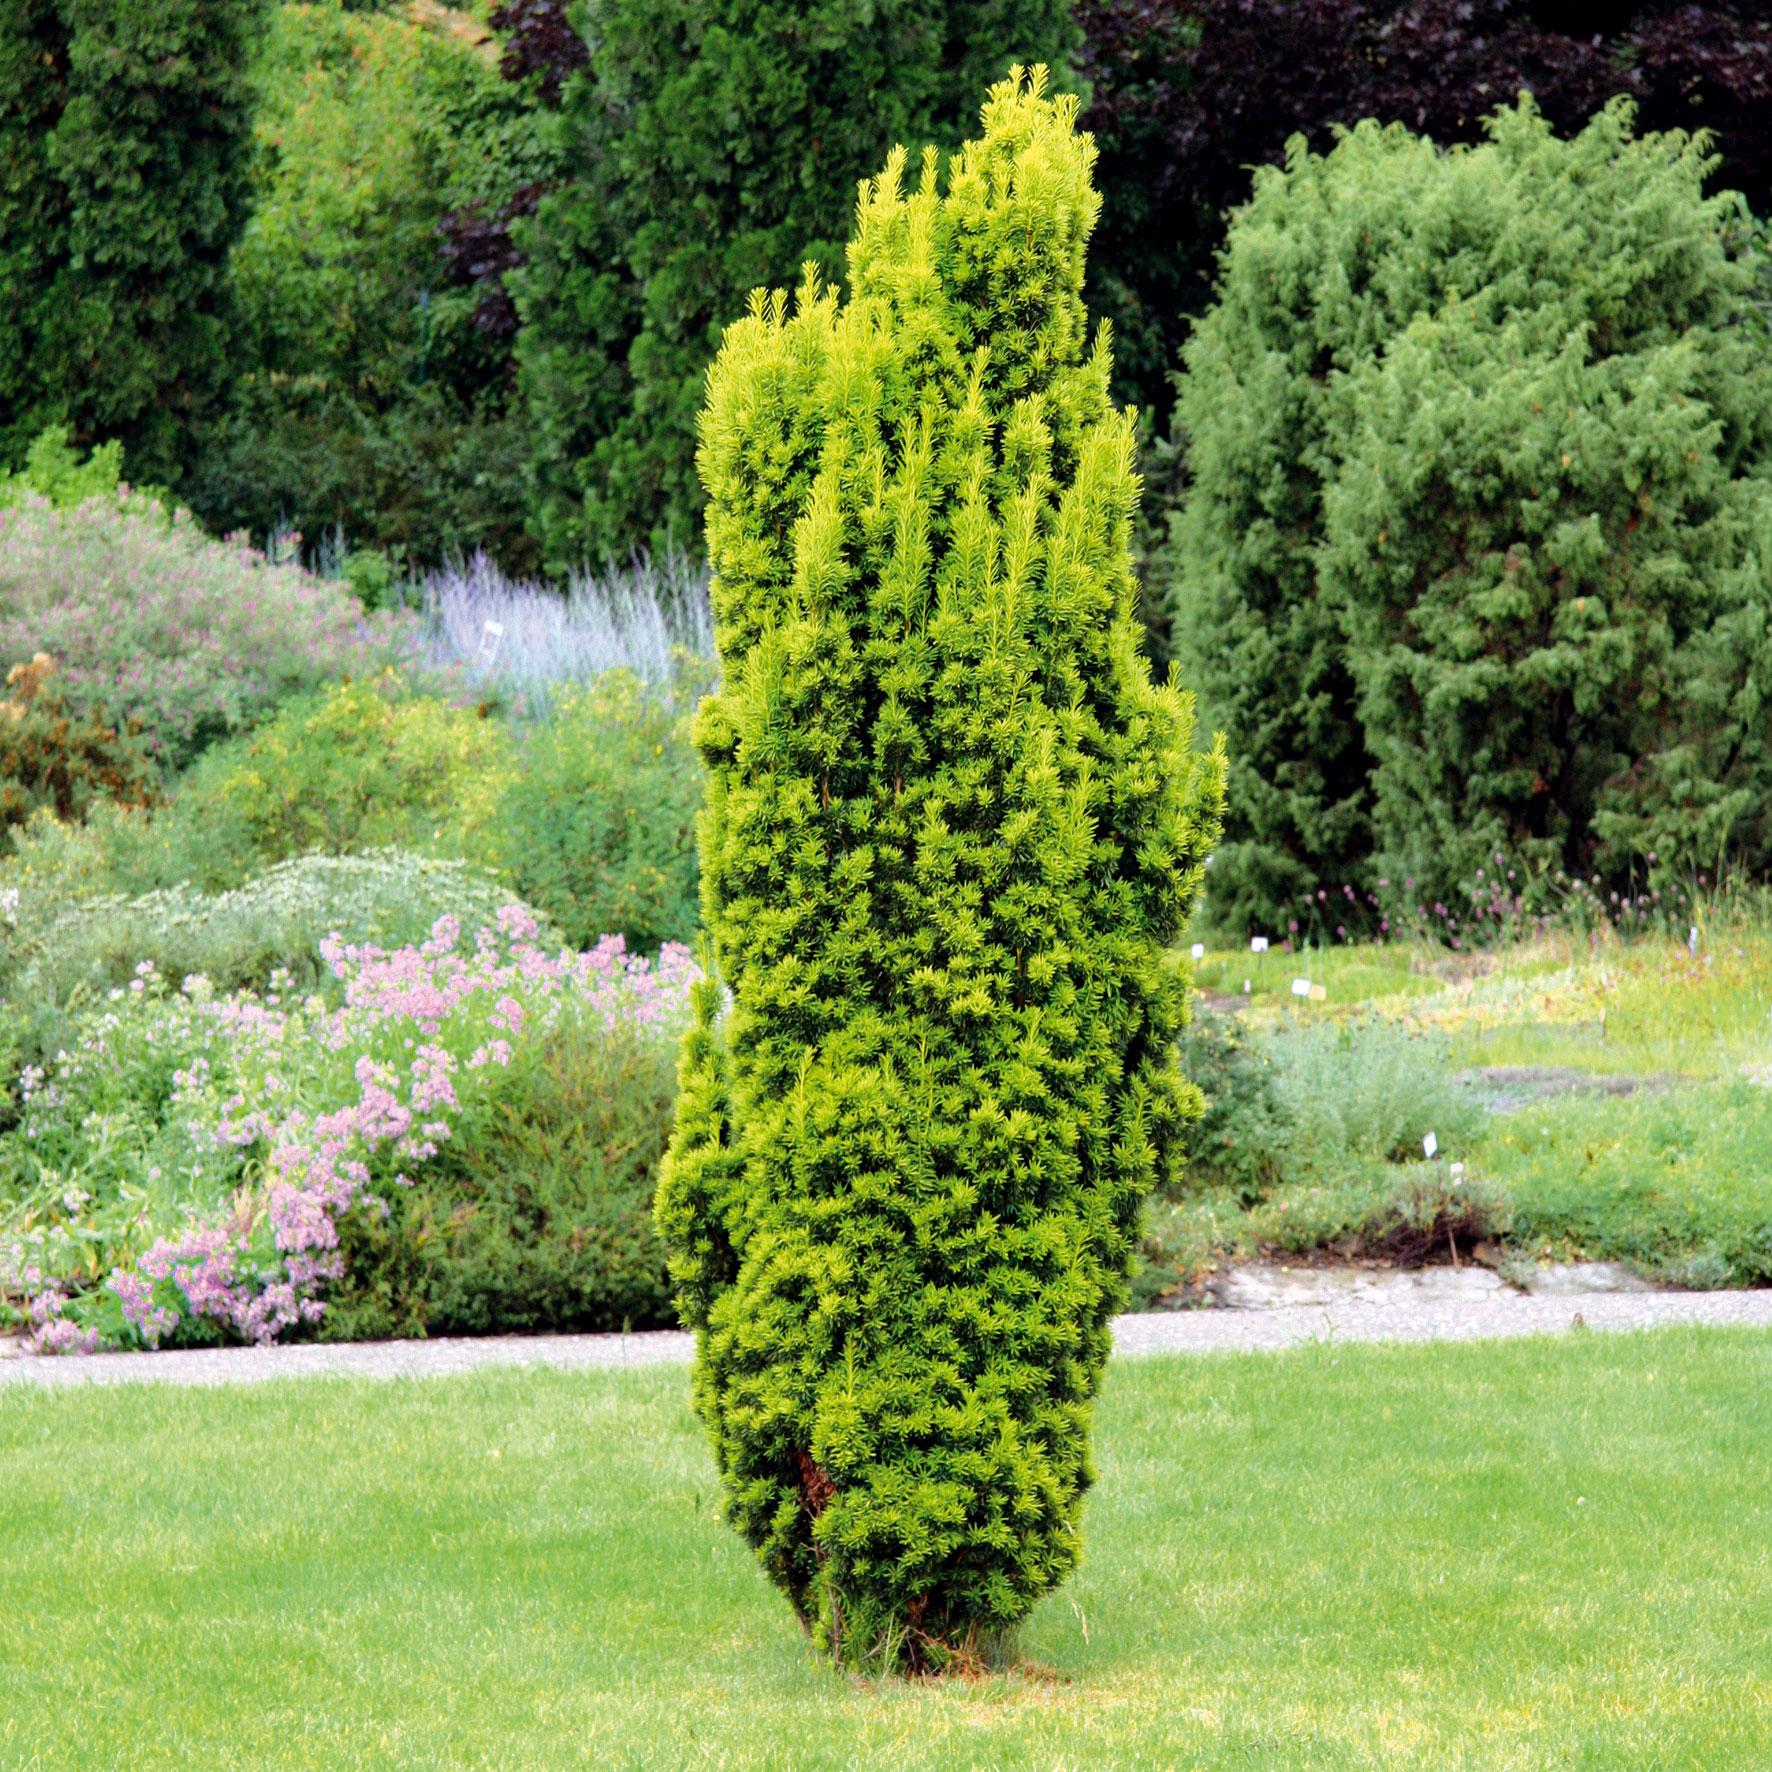 Tis červený (Taxus baccata 'David')